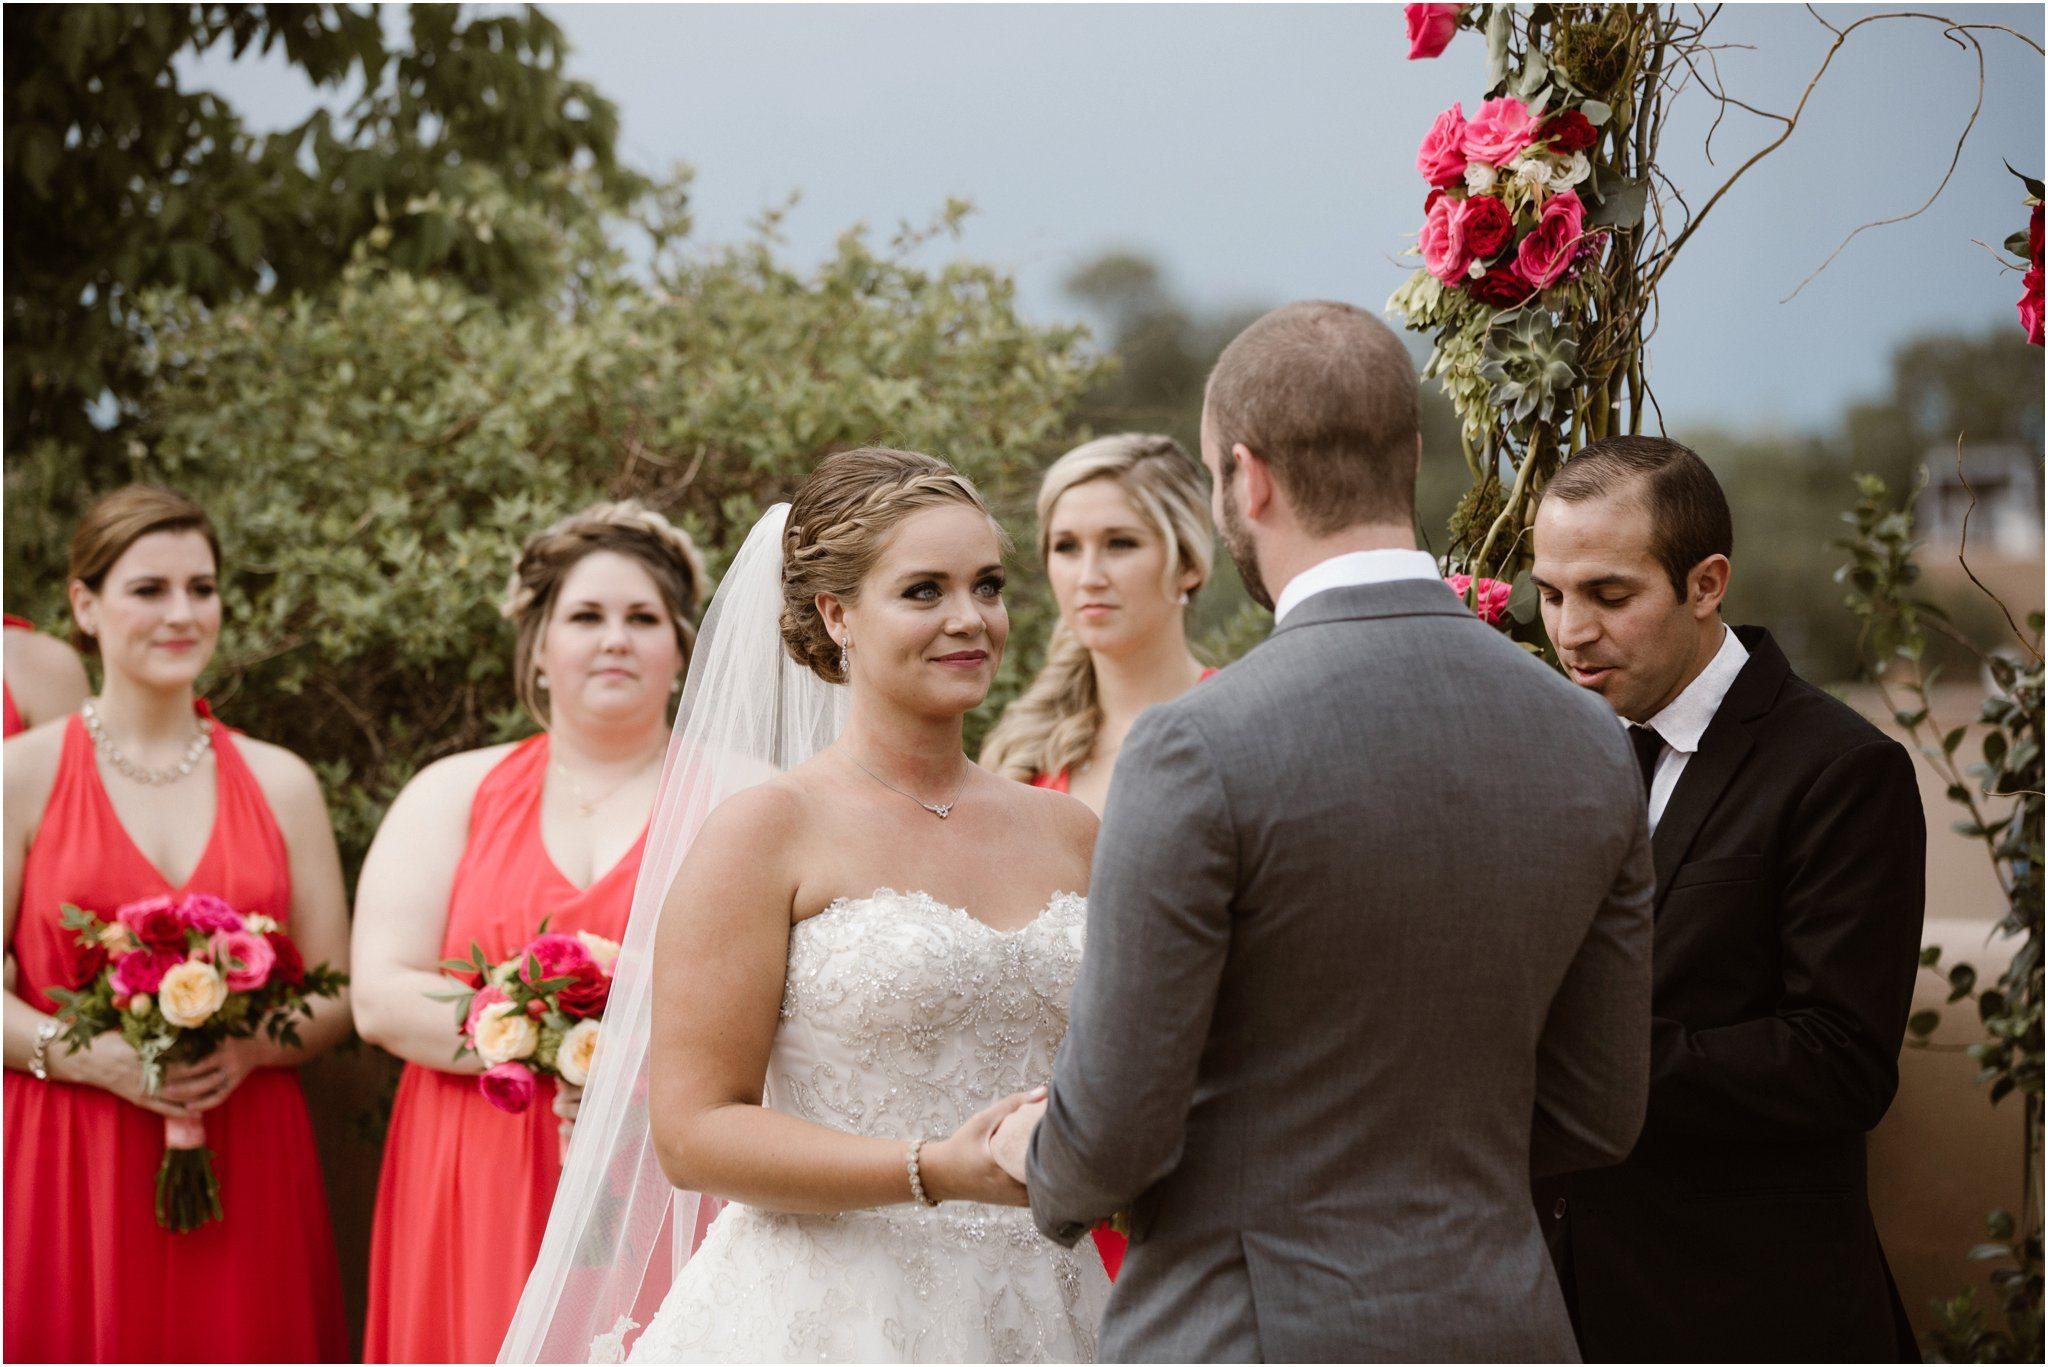 0044albuquerque-wedding-photographer_-santa-fe-wedding-photographer_-southwest-wedding-photography_-blue-rose-studio